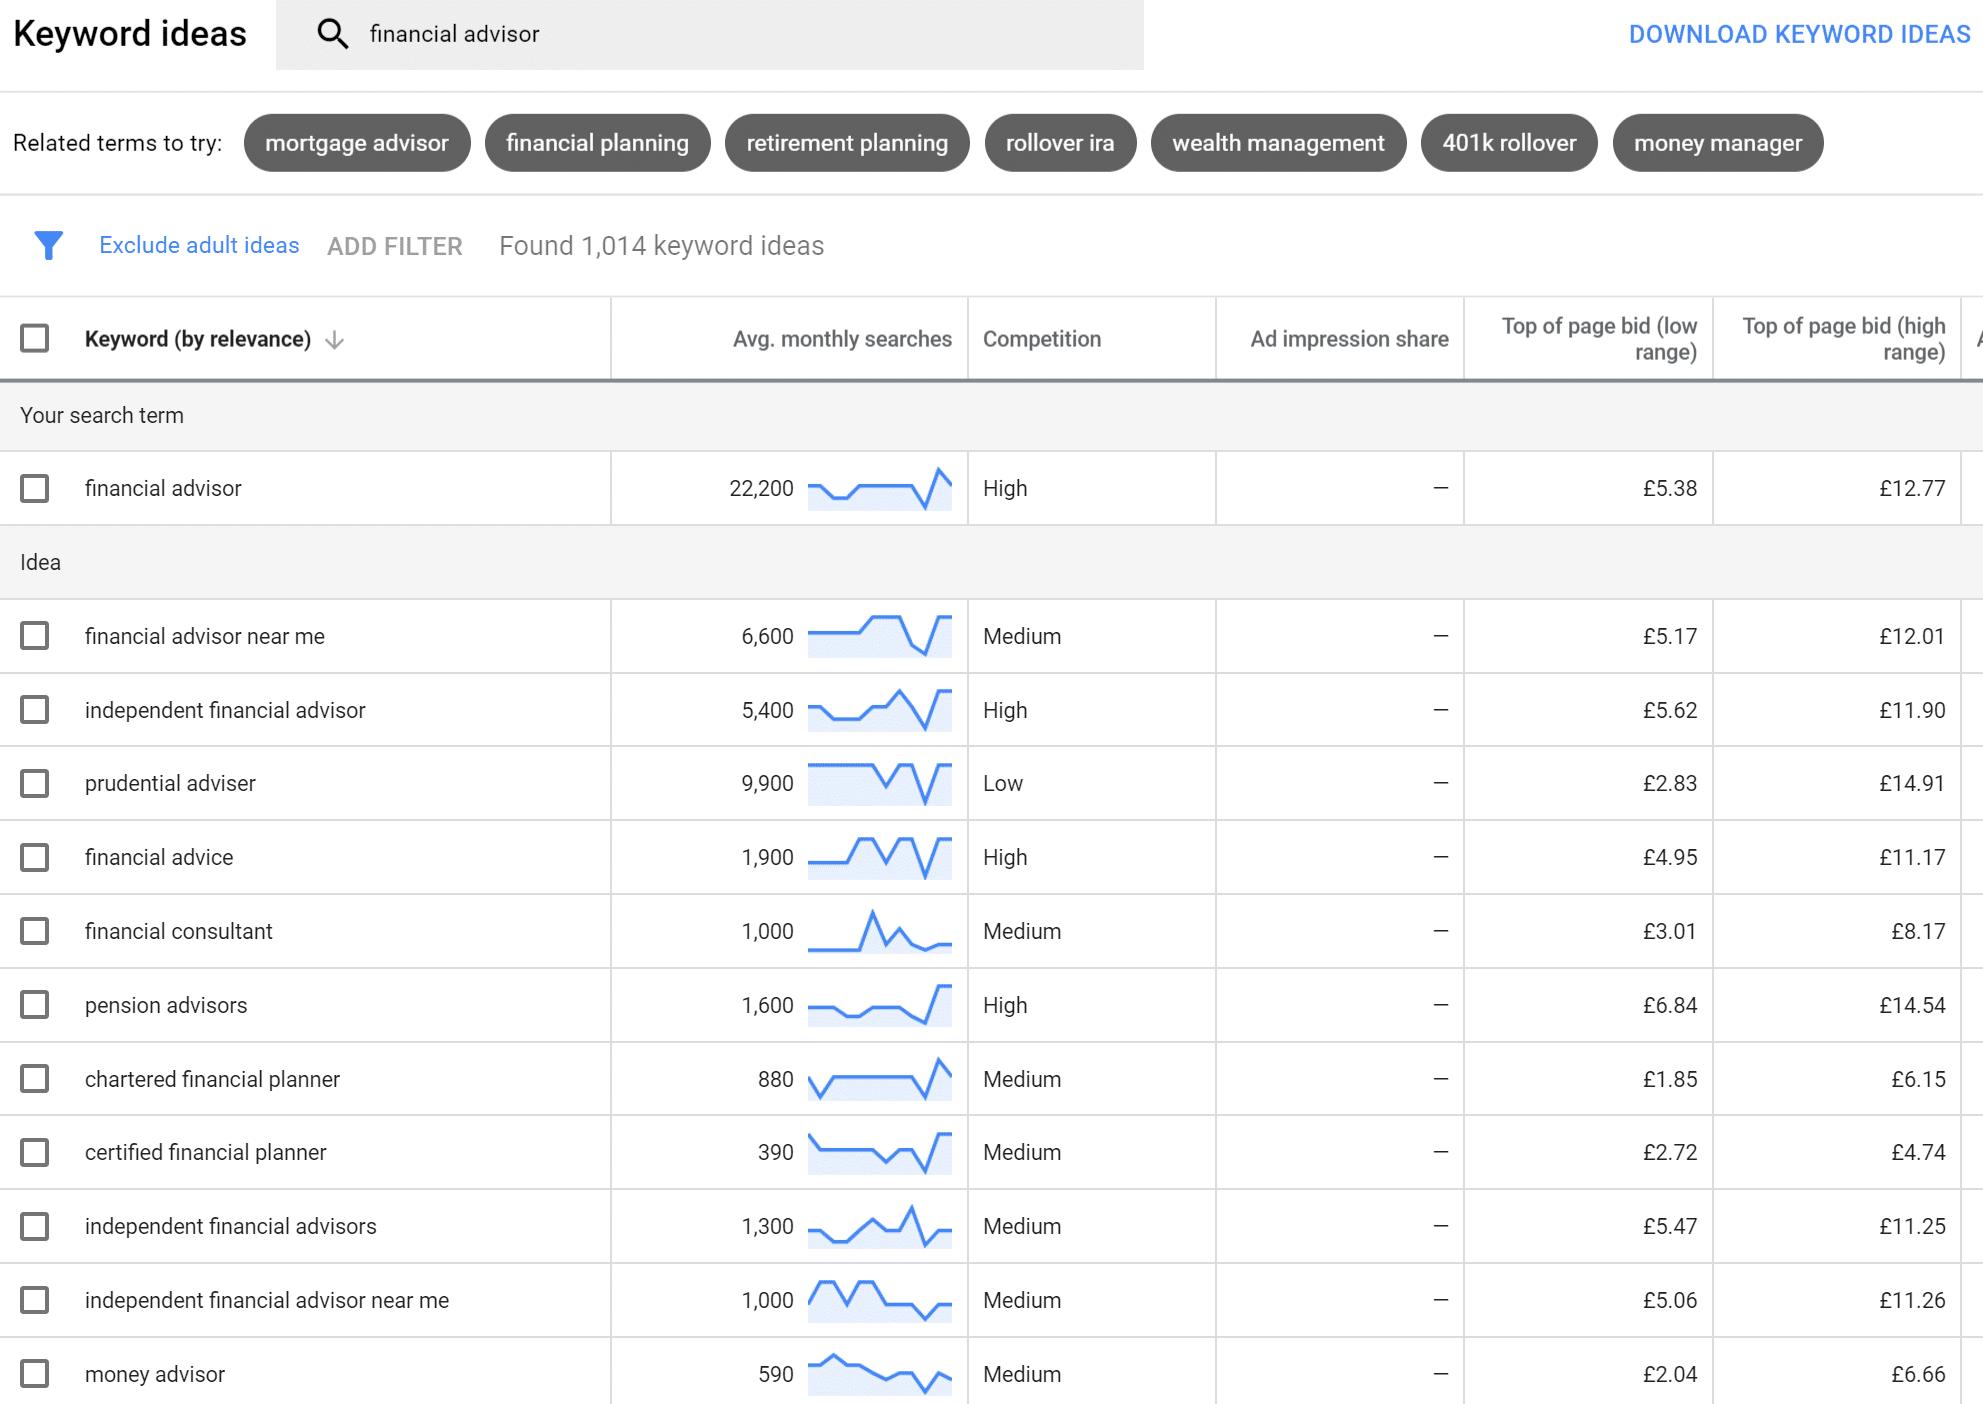 Google Ads Keyword Planner showing keywords related to 'financial advisor'